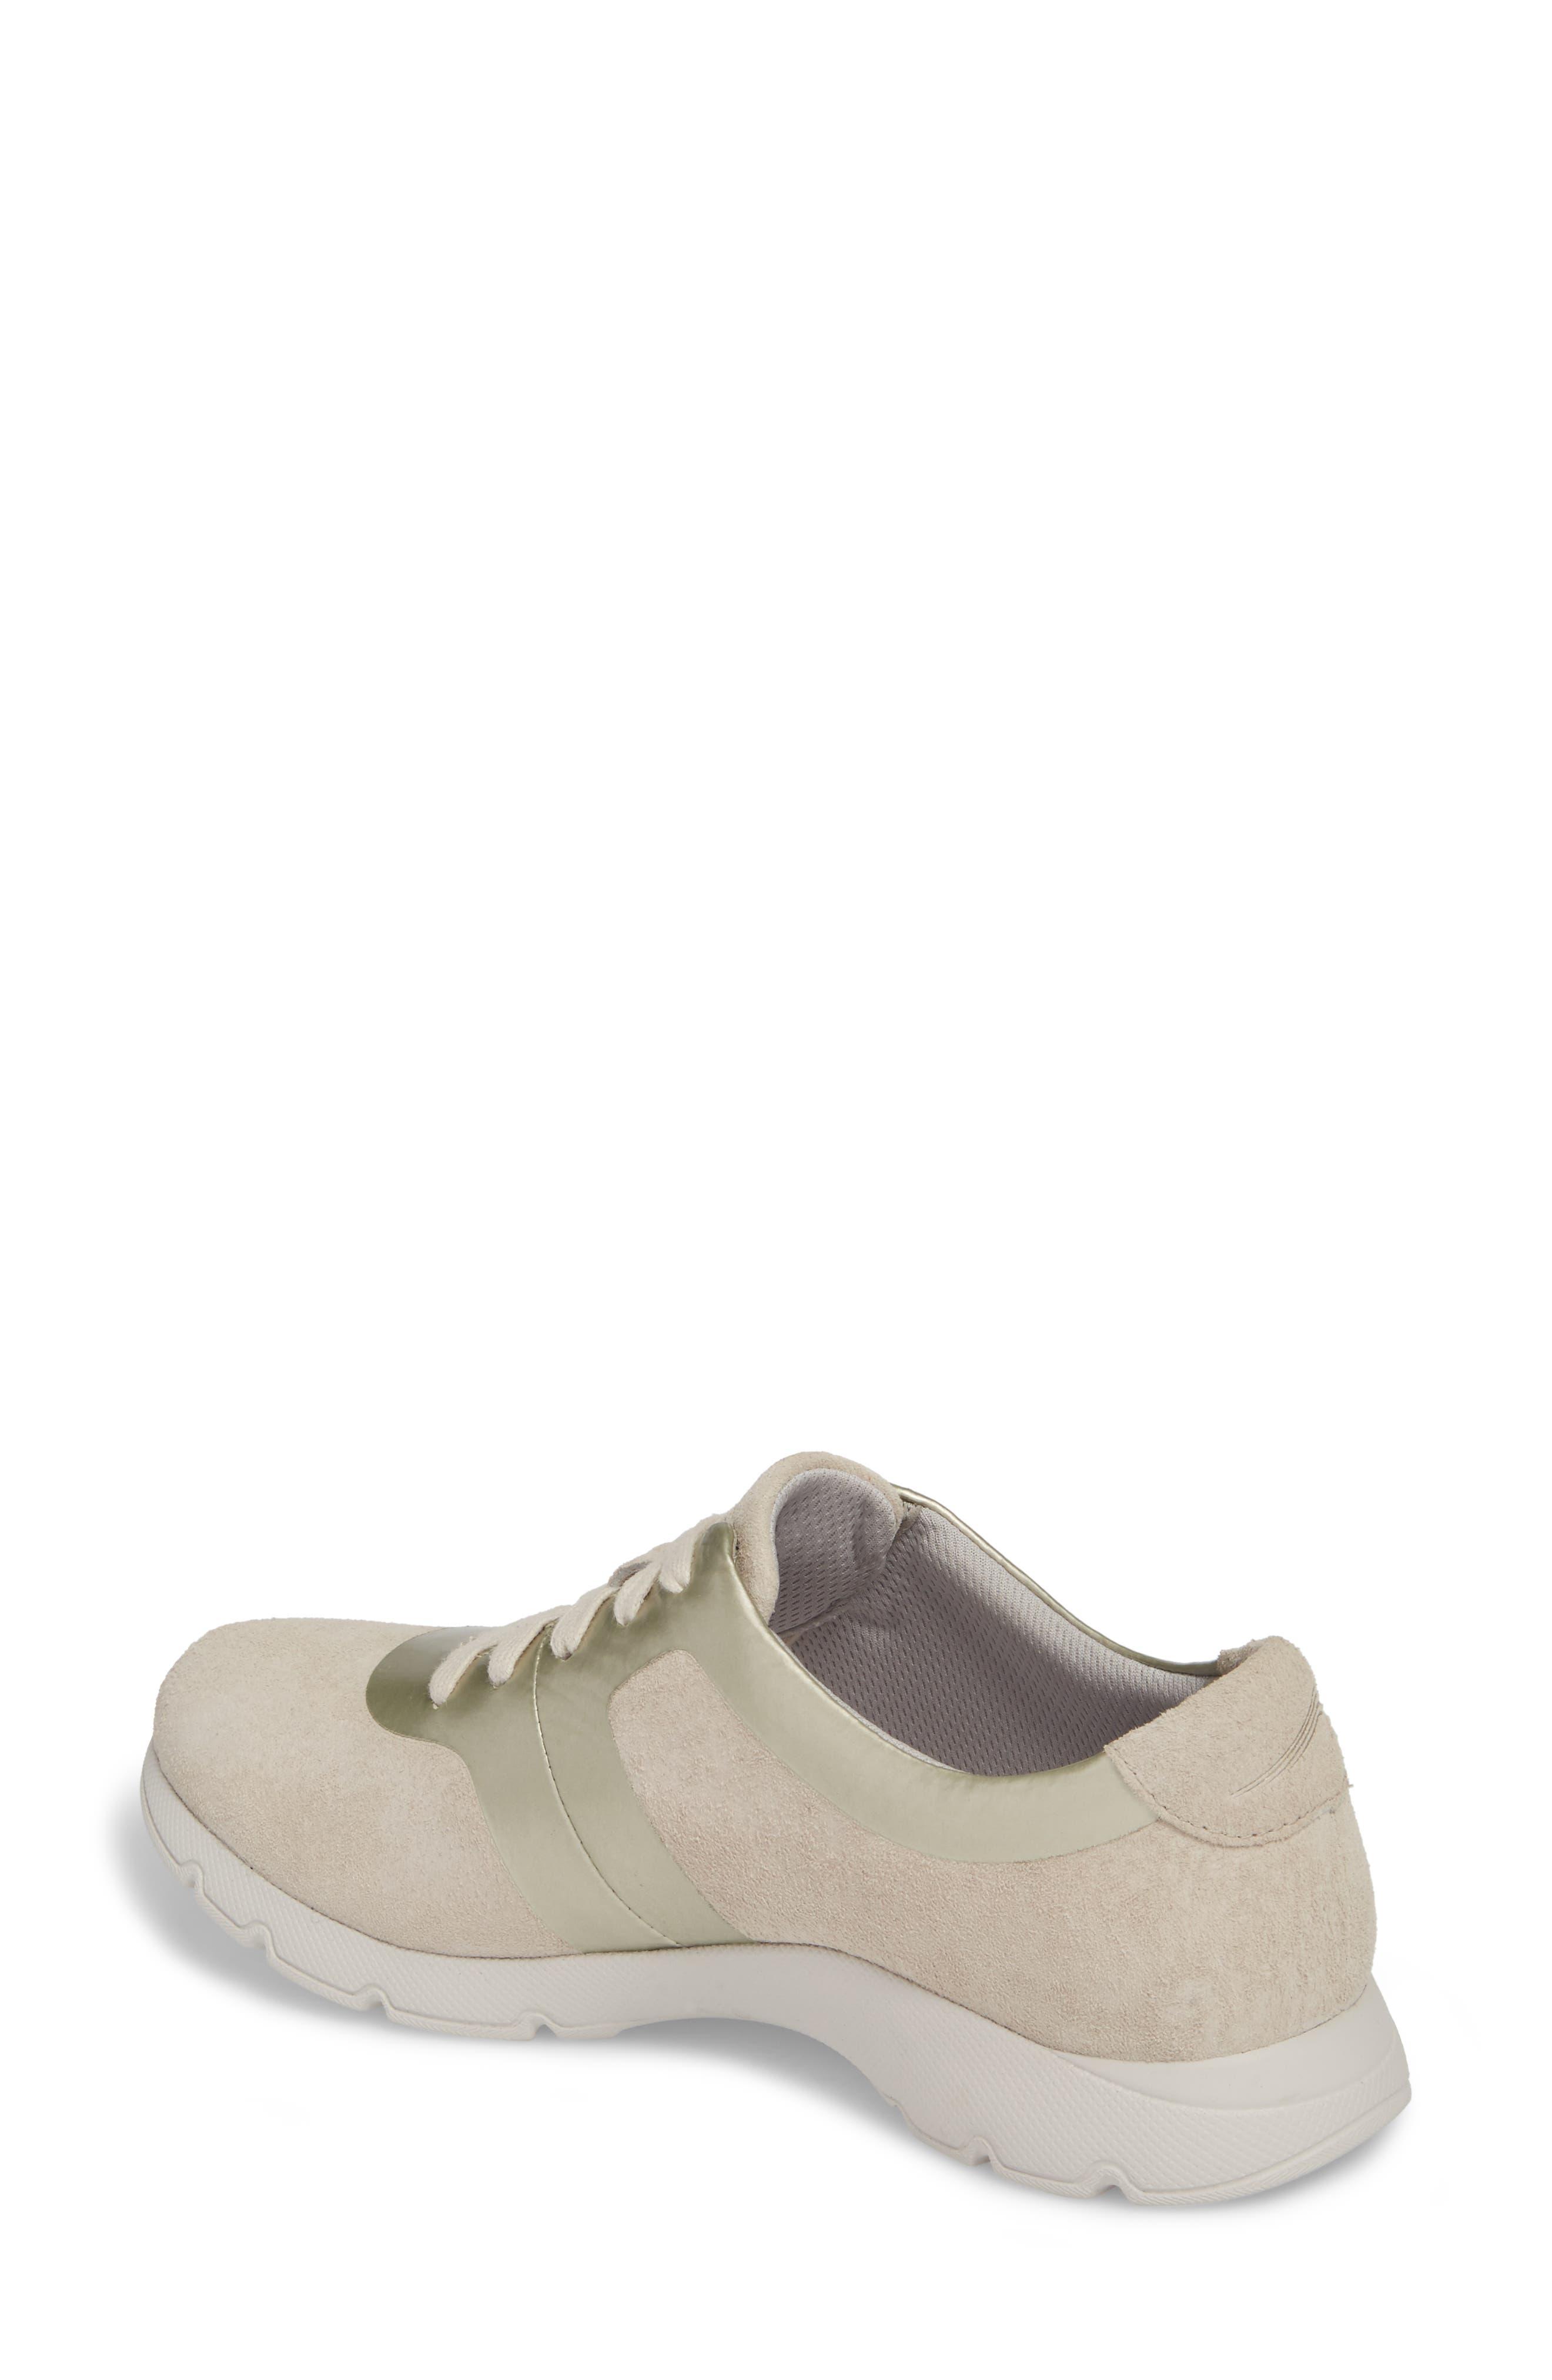 Andi Sneaker,                             Alternate thumbnail 4, color,